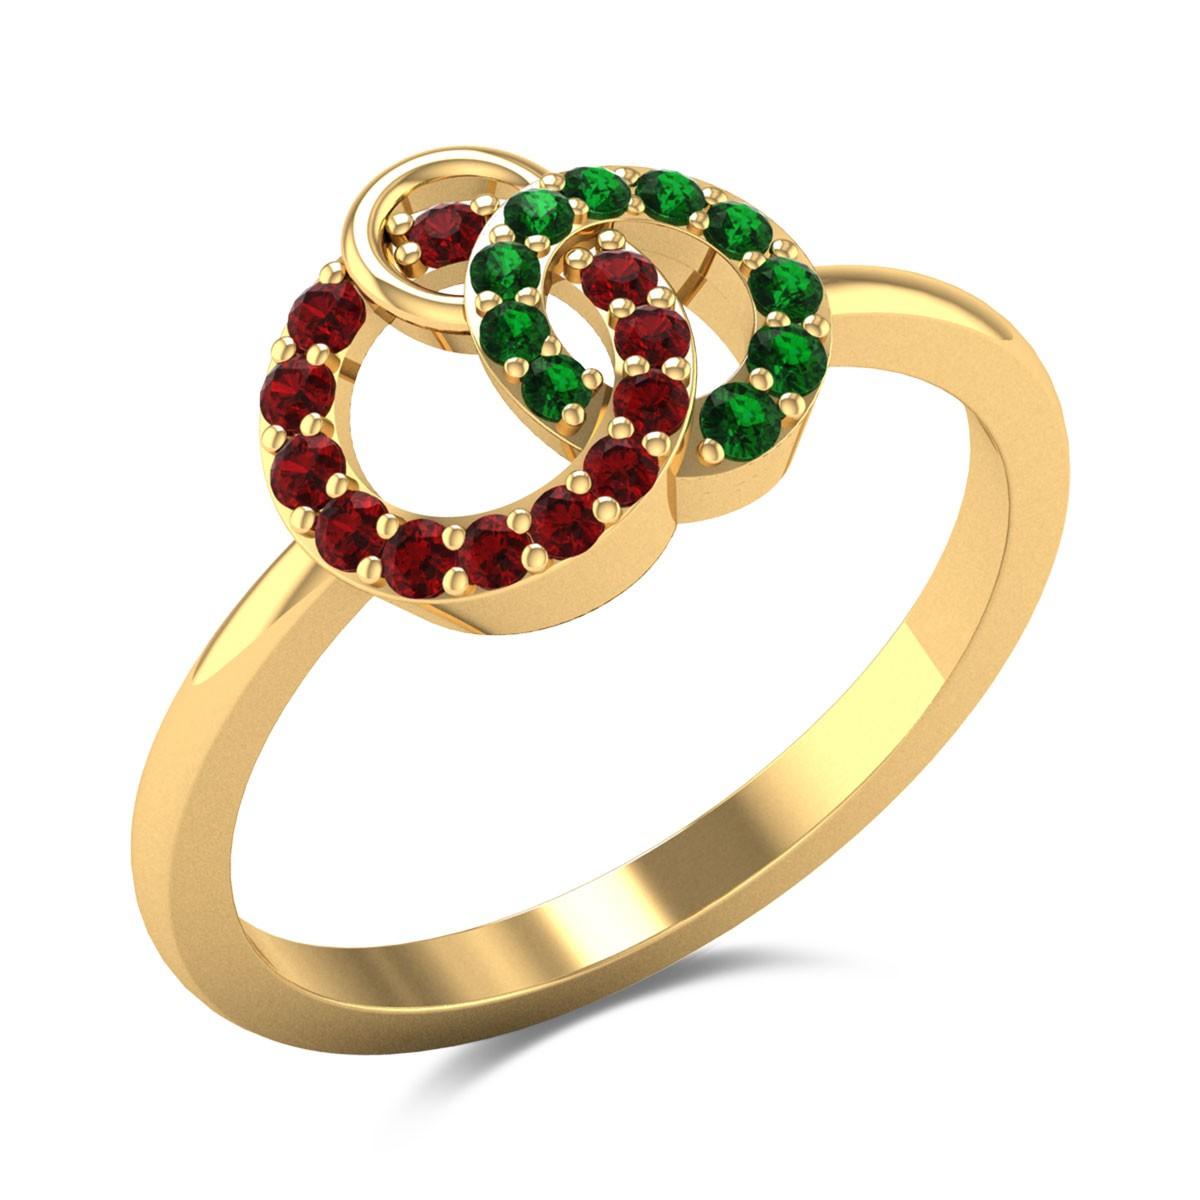 Three Ring Interwined Ring